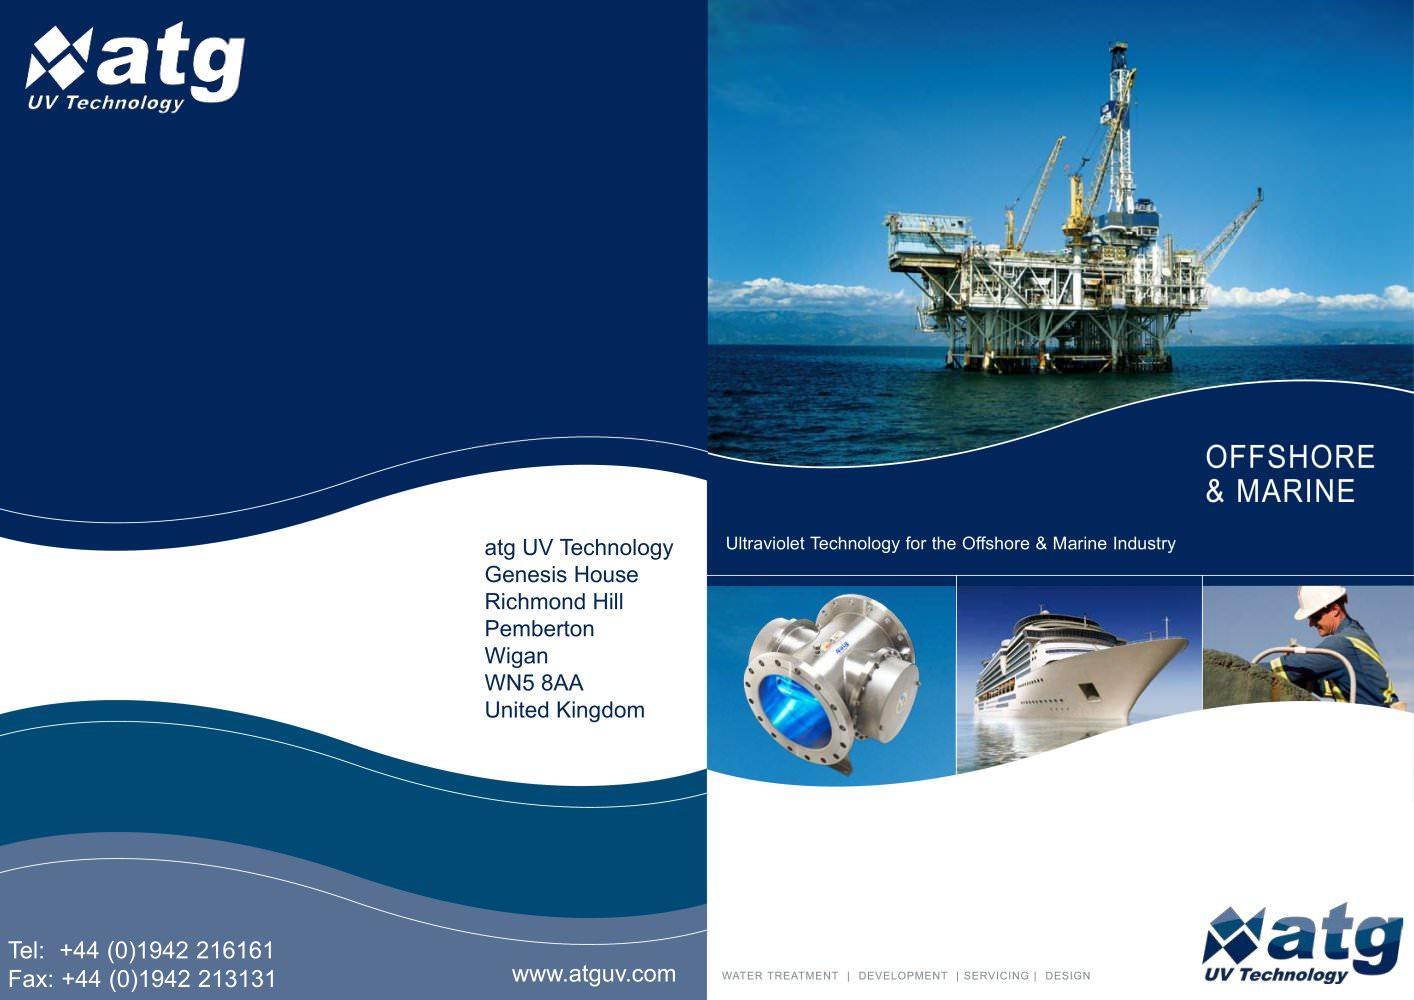 Offshore Marine Atg Uv Technology Pdf Catalogs Technical